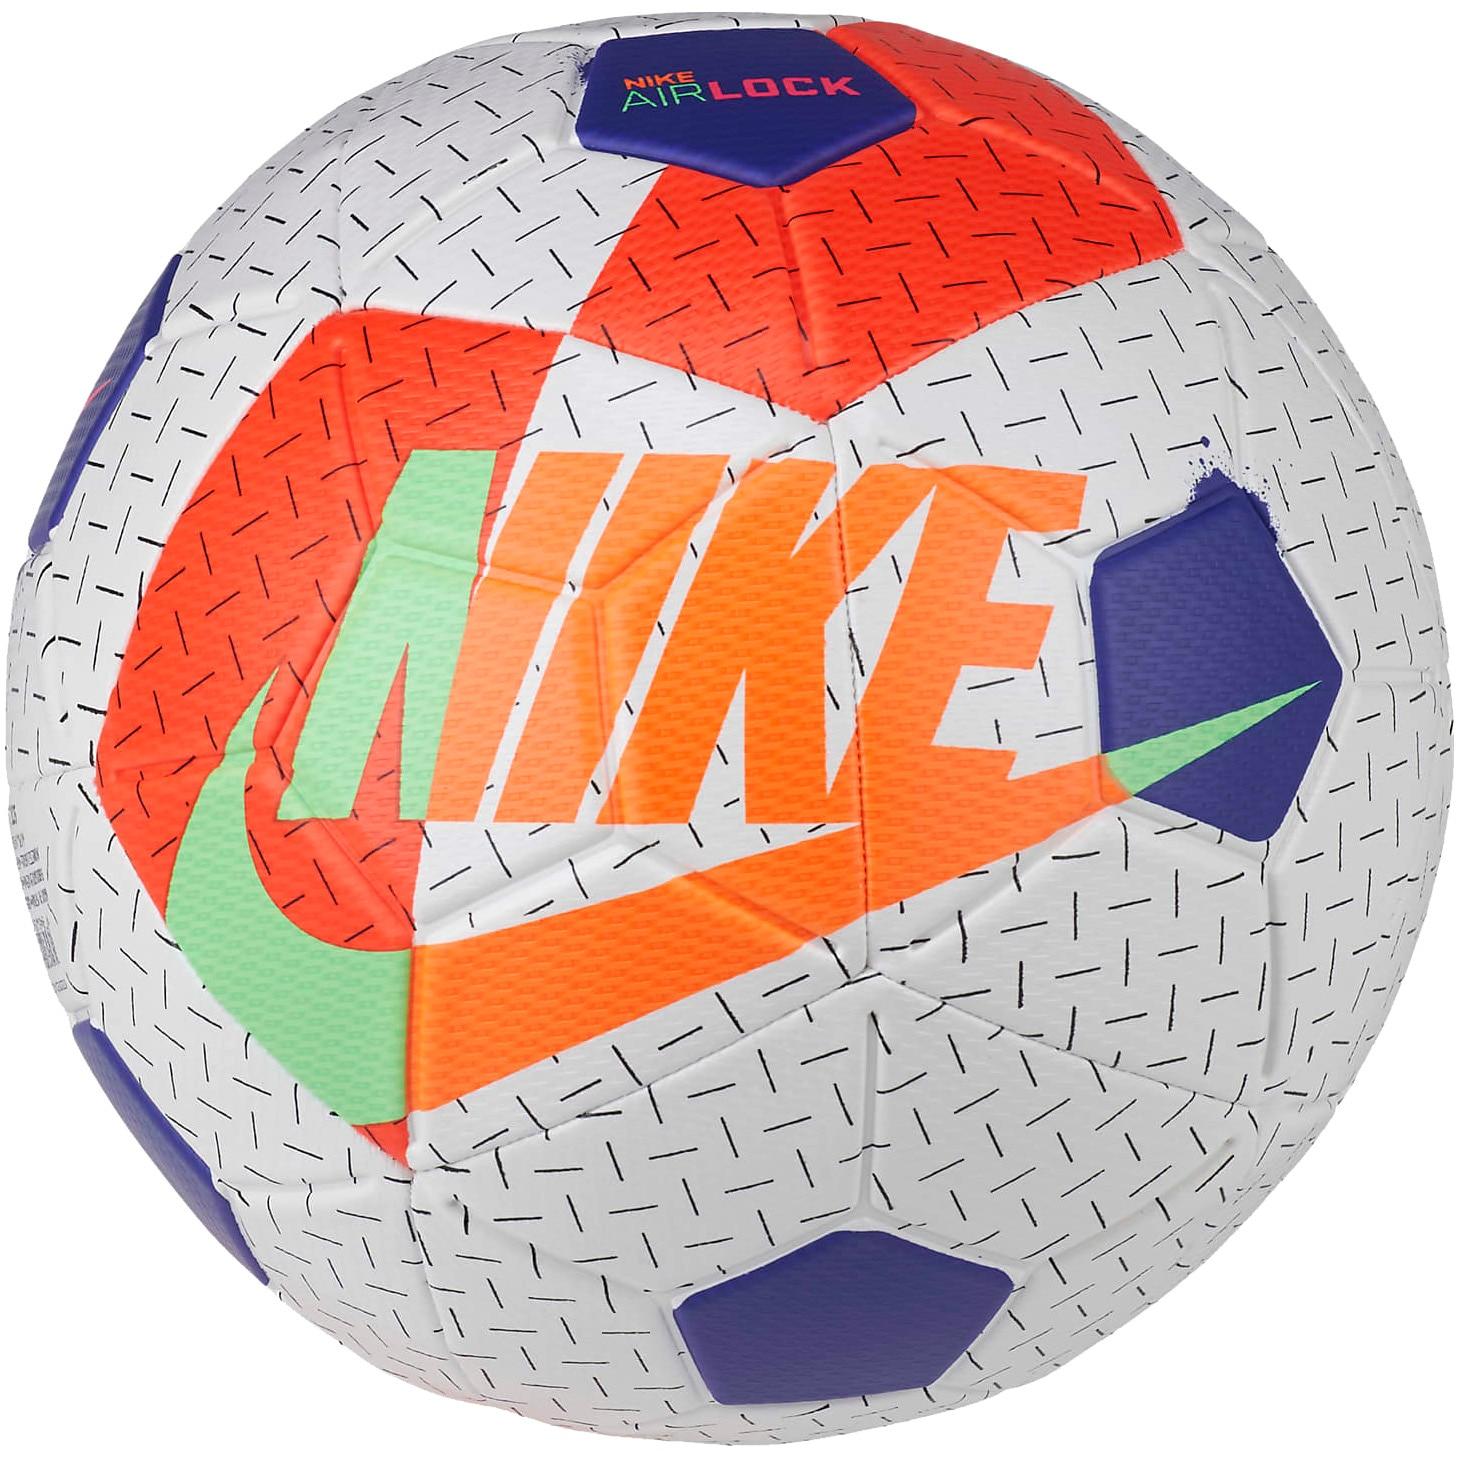 Fotografie Minge fotbal Nike Airlock Street X, White/Multicolor, 5